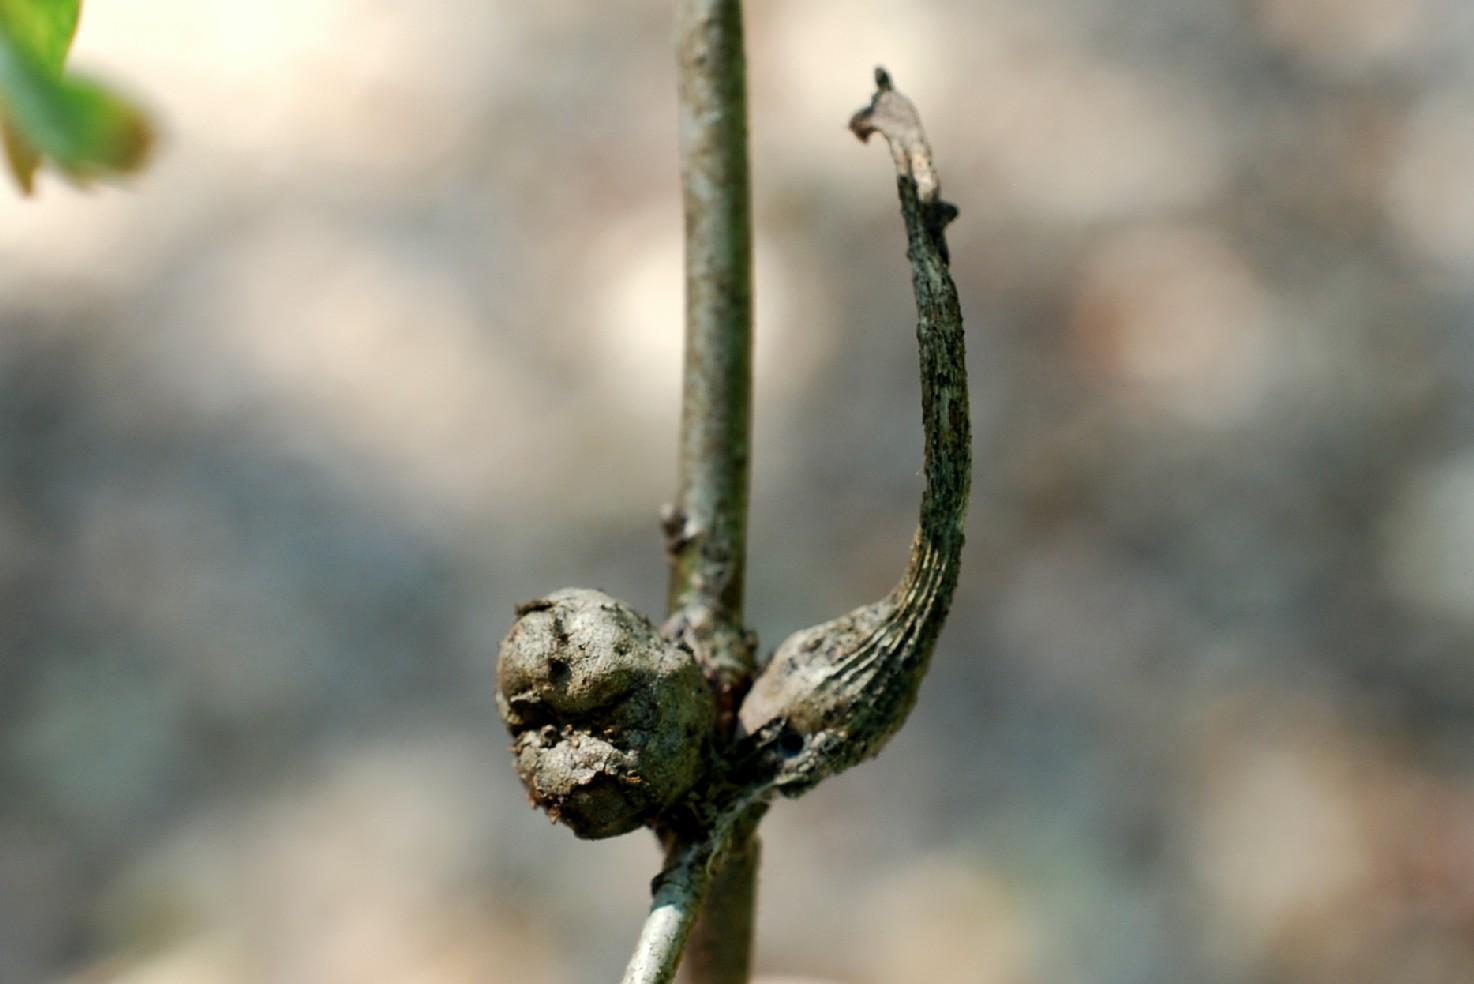 Andricus aries - Hymenoptera, Cynipidae 4